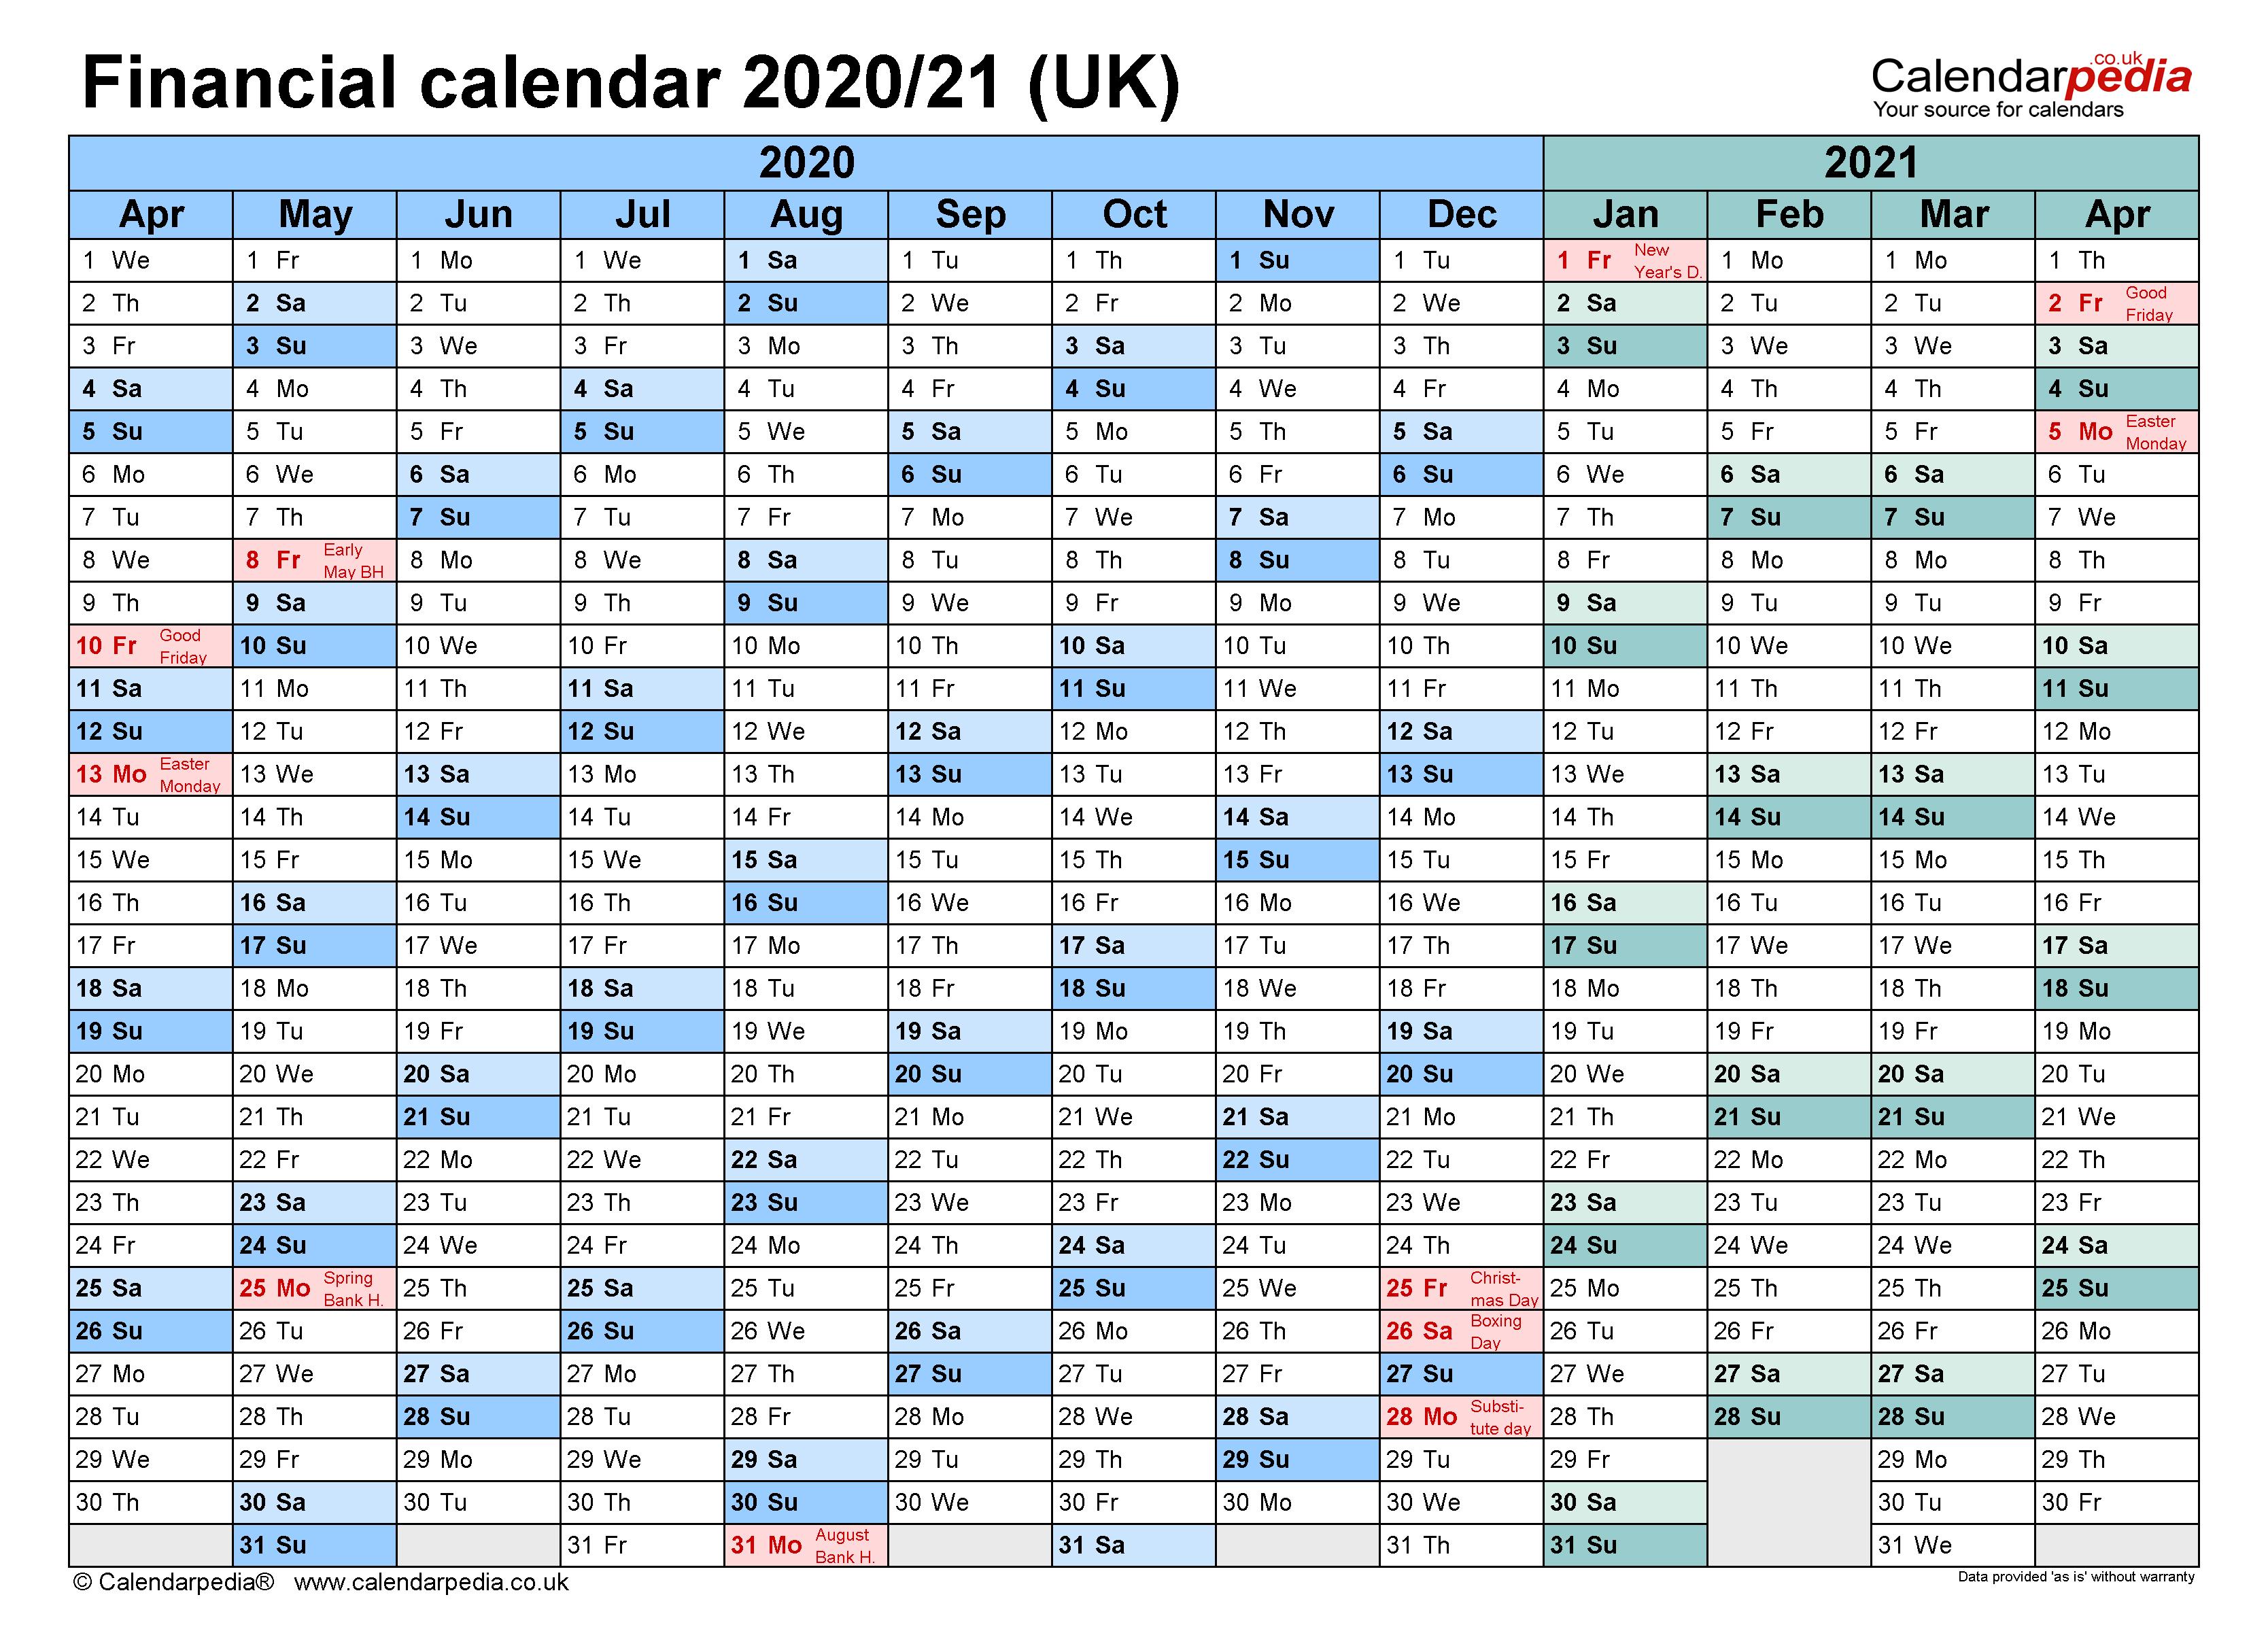 Financial calendars 2020/21 (UK) in Microsoft Word format